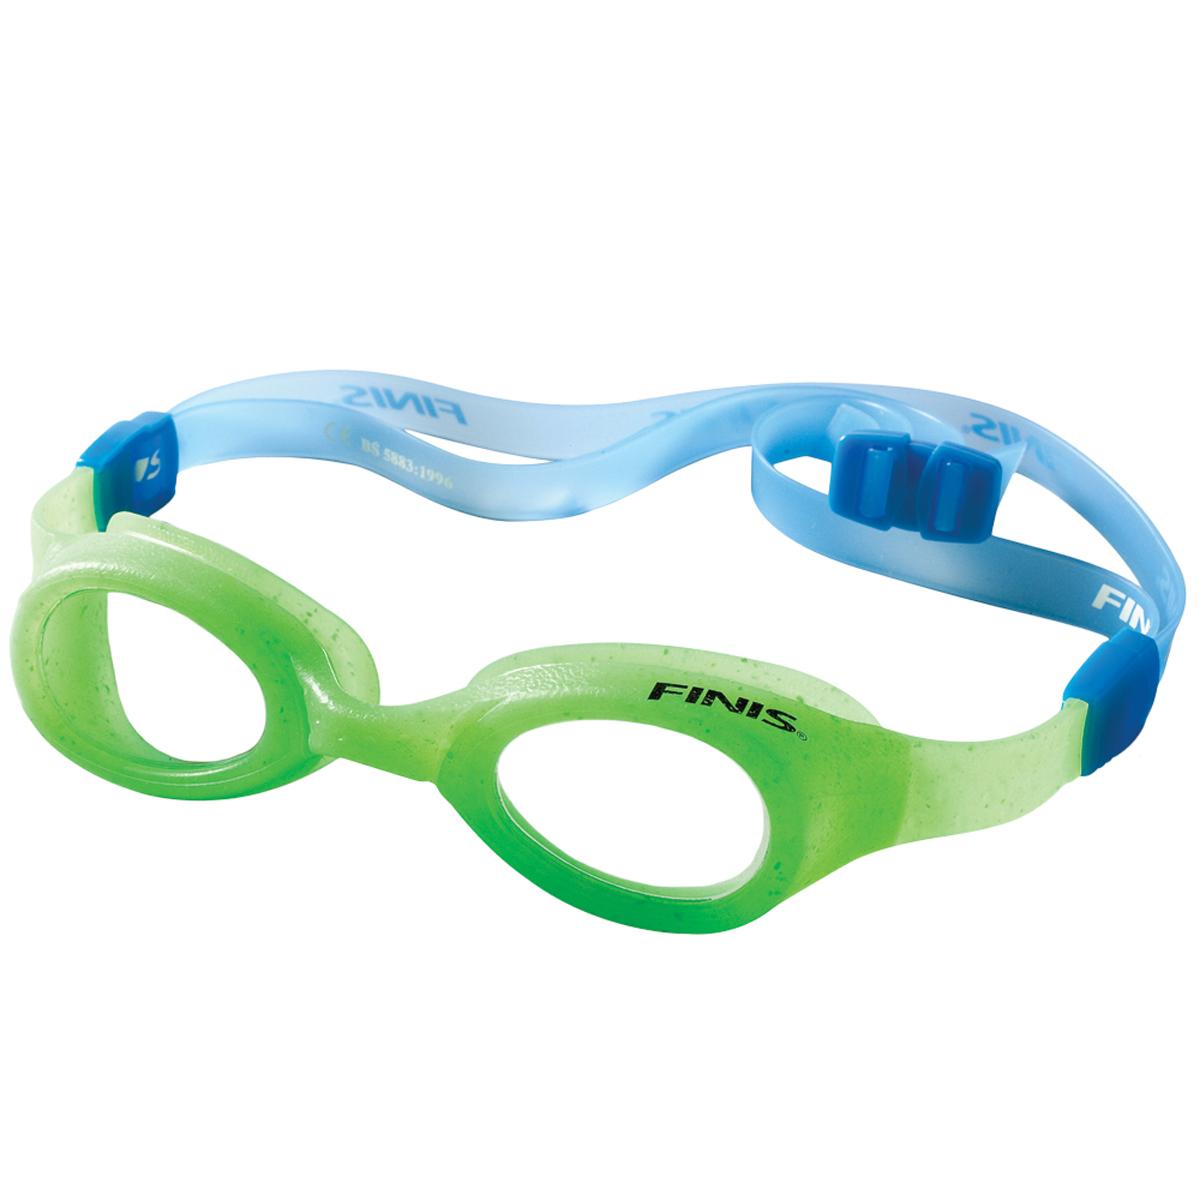 16200d530e7c FINIS Fruit Basket Swim Goggles - Green Sour Apple 616323518018